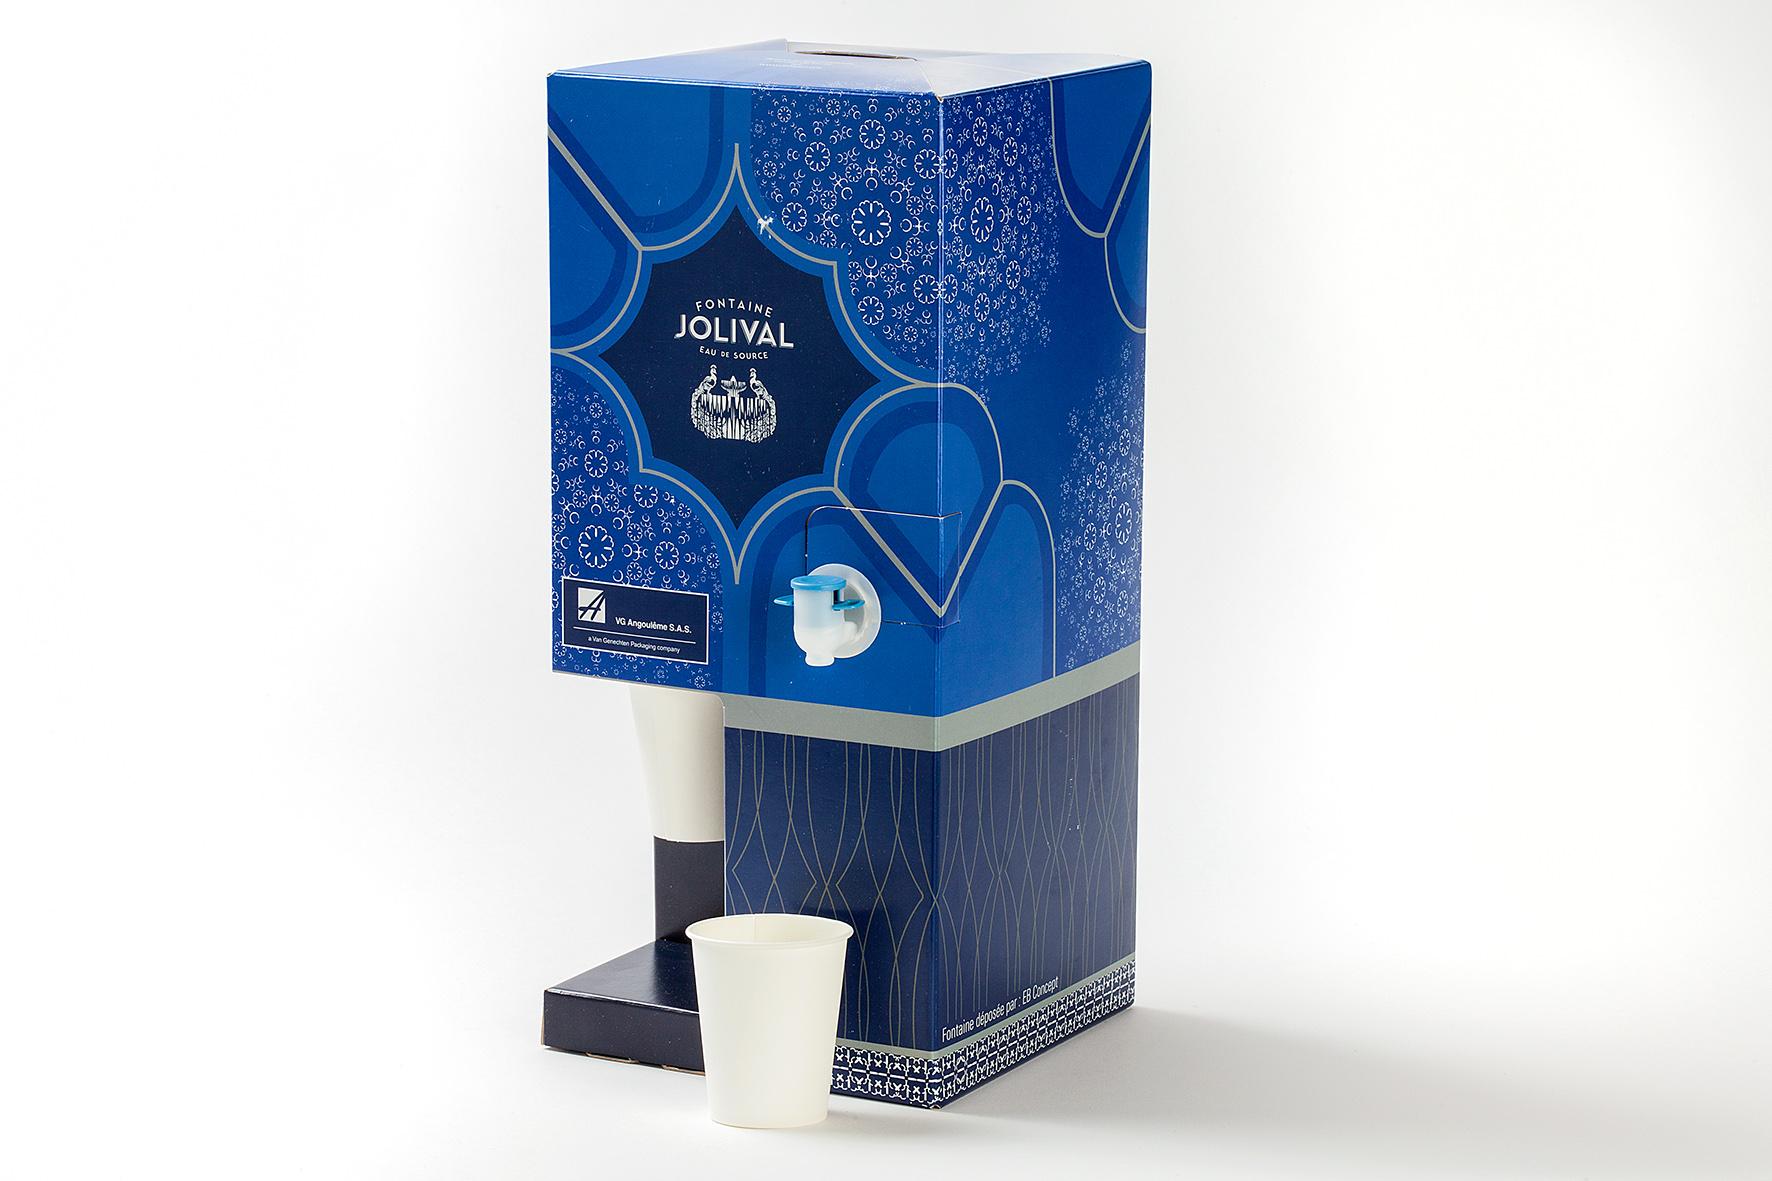 carton-award-image 140411